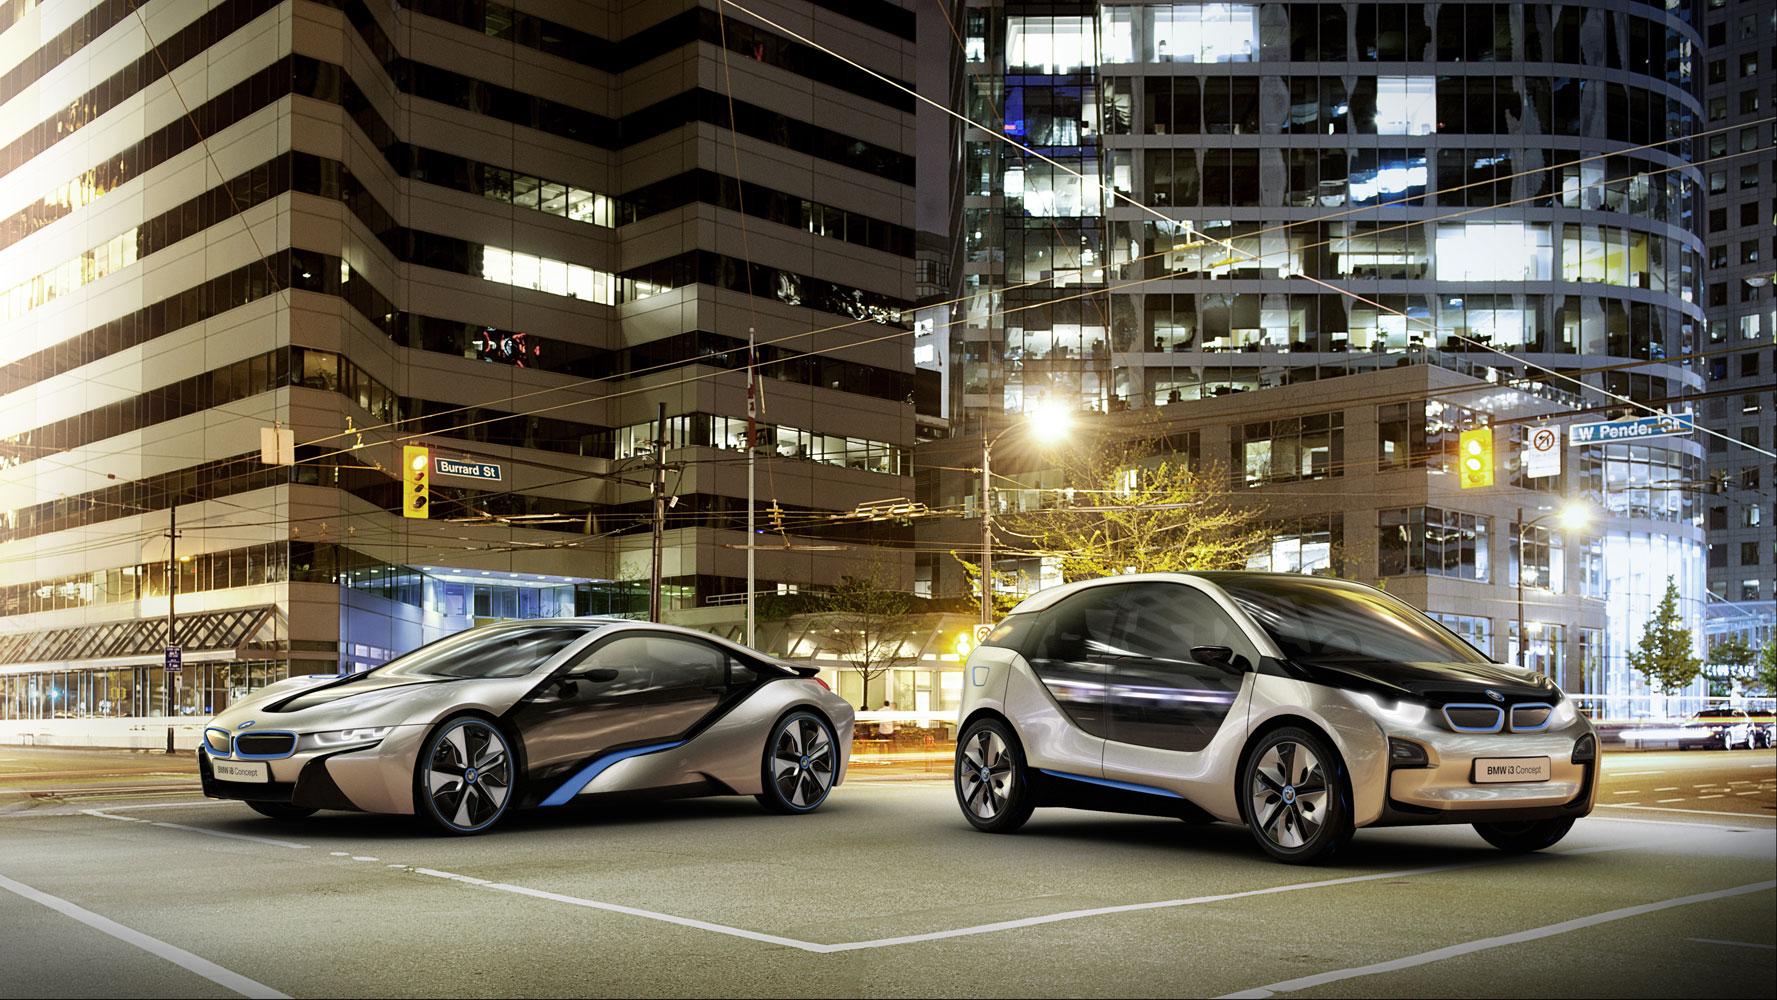 Promotion Video des BMW i3 Concept und i8 Concept